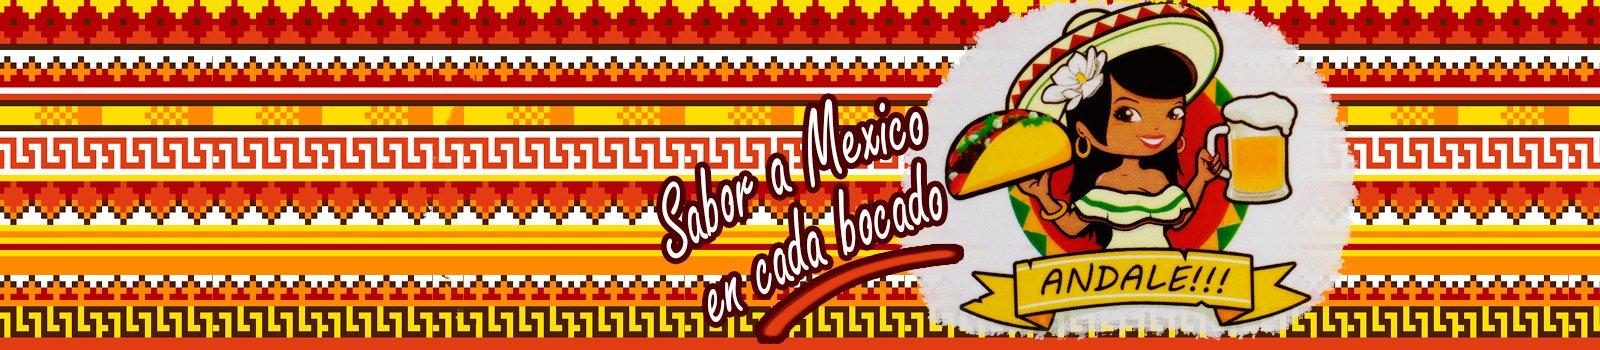 Tacos pastor, cocina mexicana, coronitas, sol